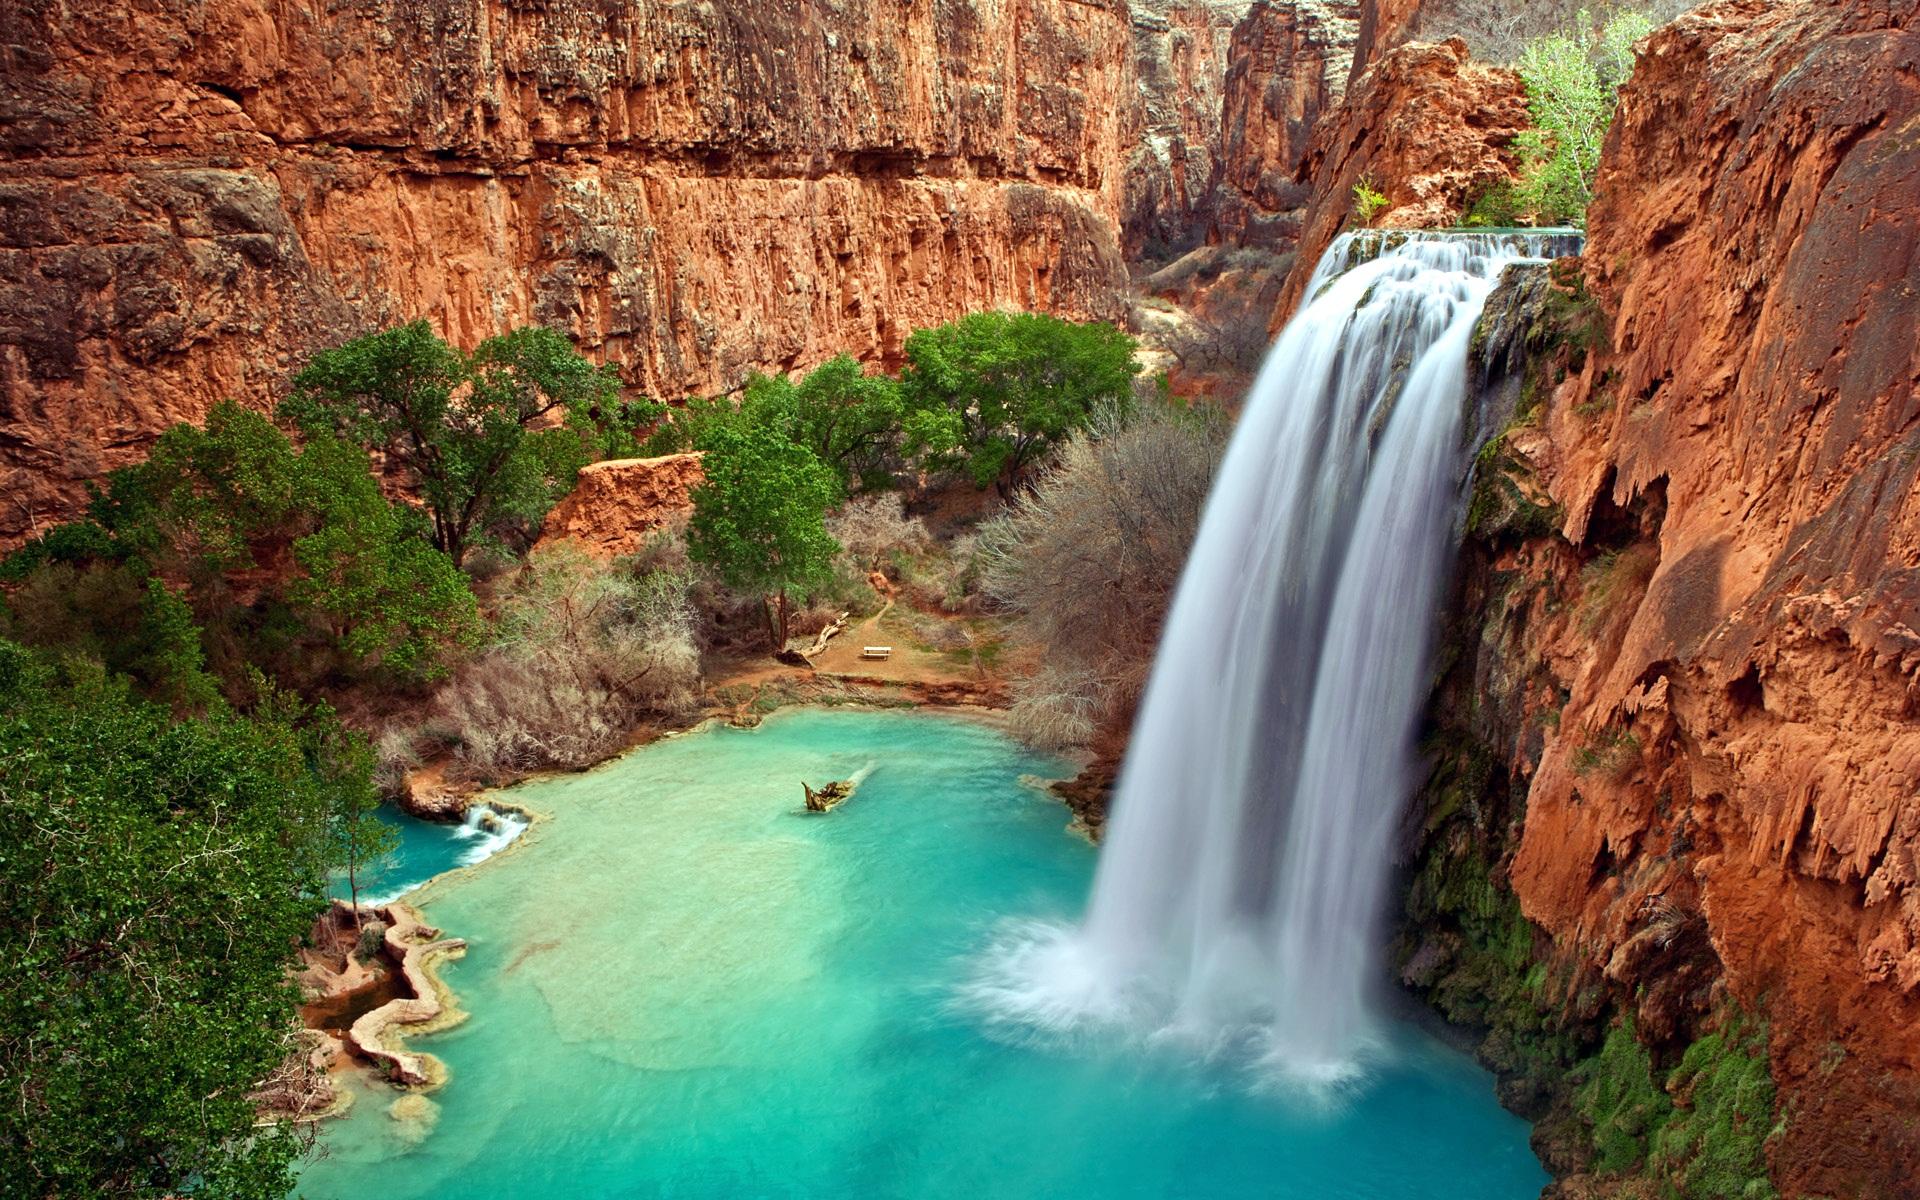 Full Hd Wallpapers For Iphone 4 Arizona Waterfalls Wallpapers Hd Wallpapers Id 10506